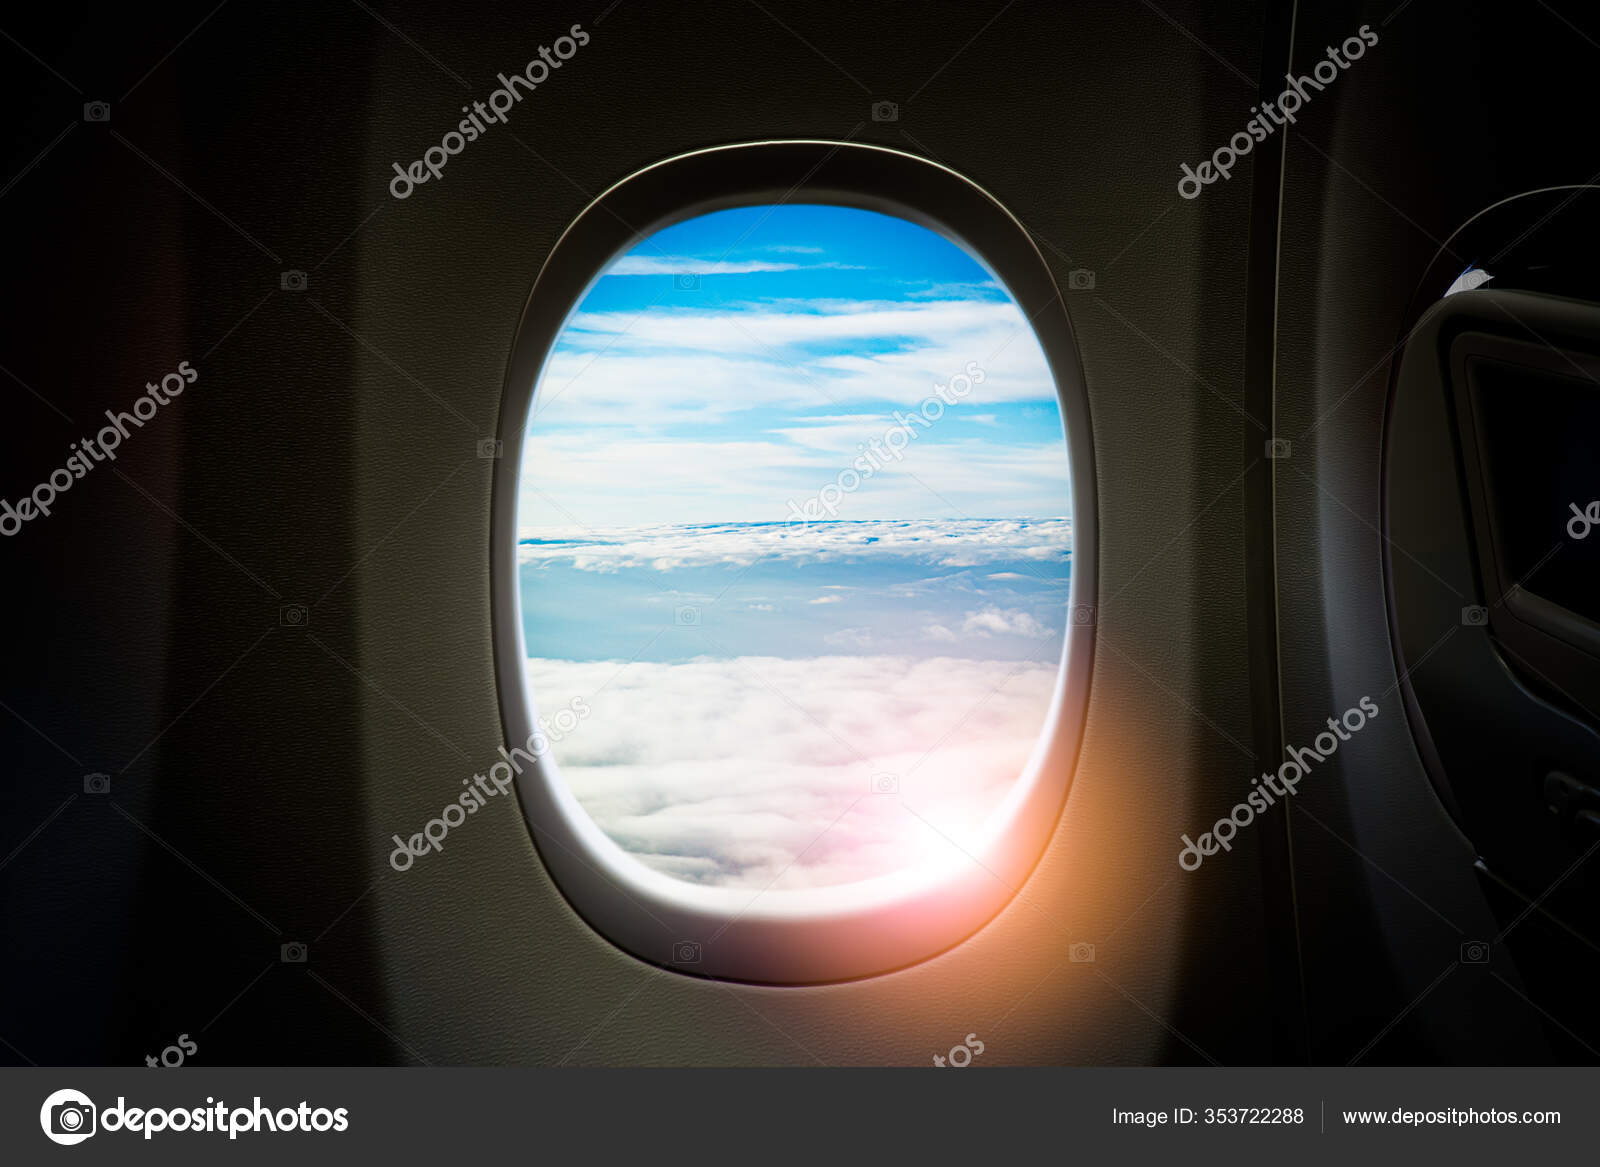 Black Background Copy Space Look Window Seat Frame Airplane Flight